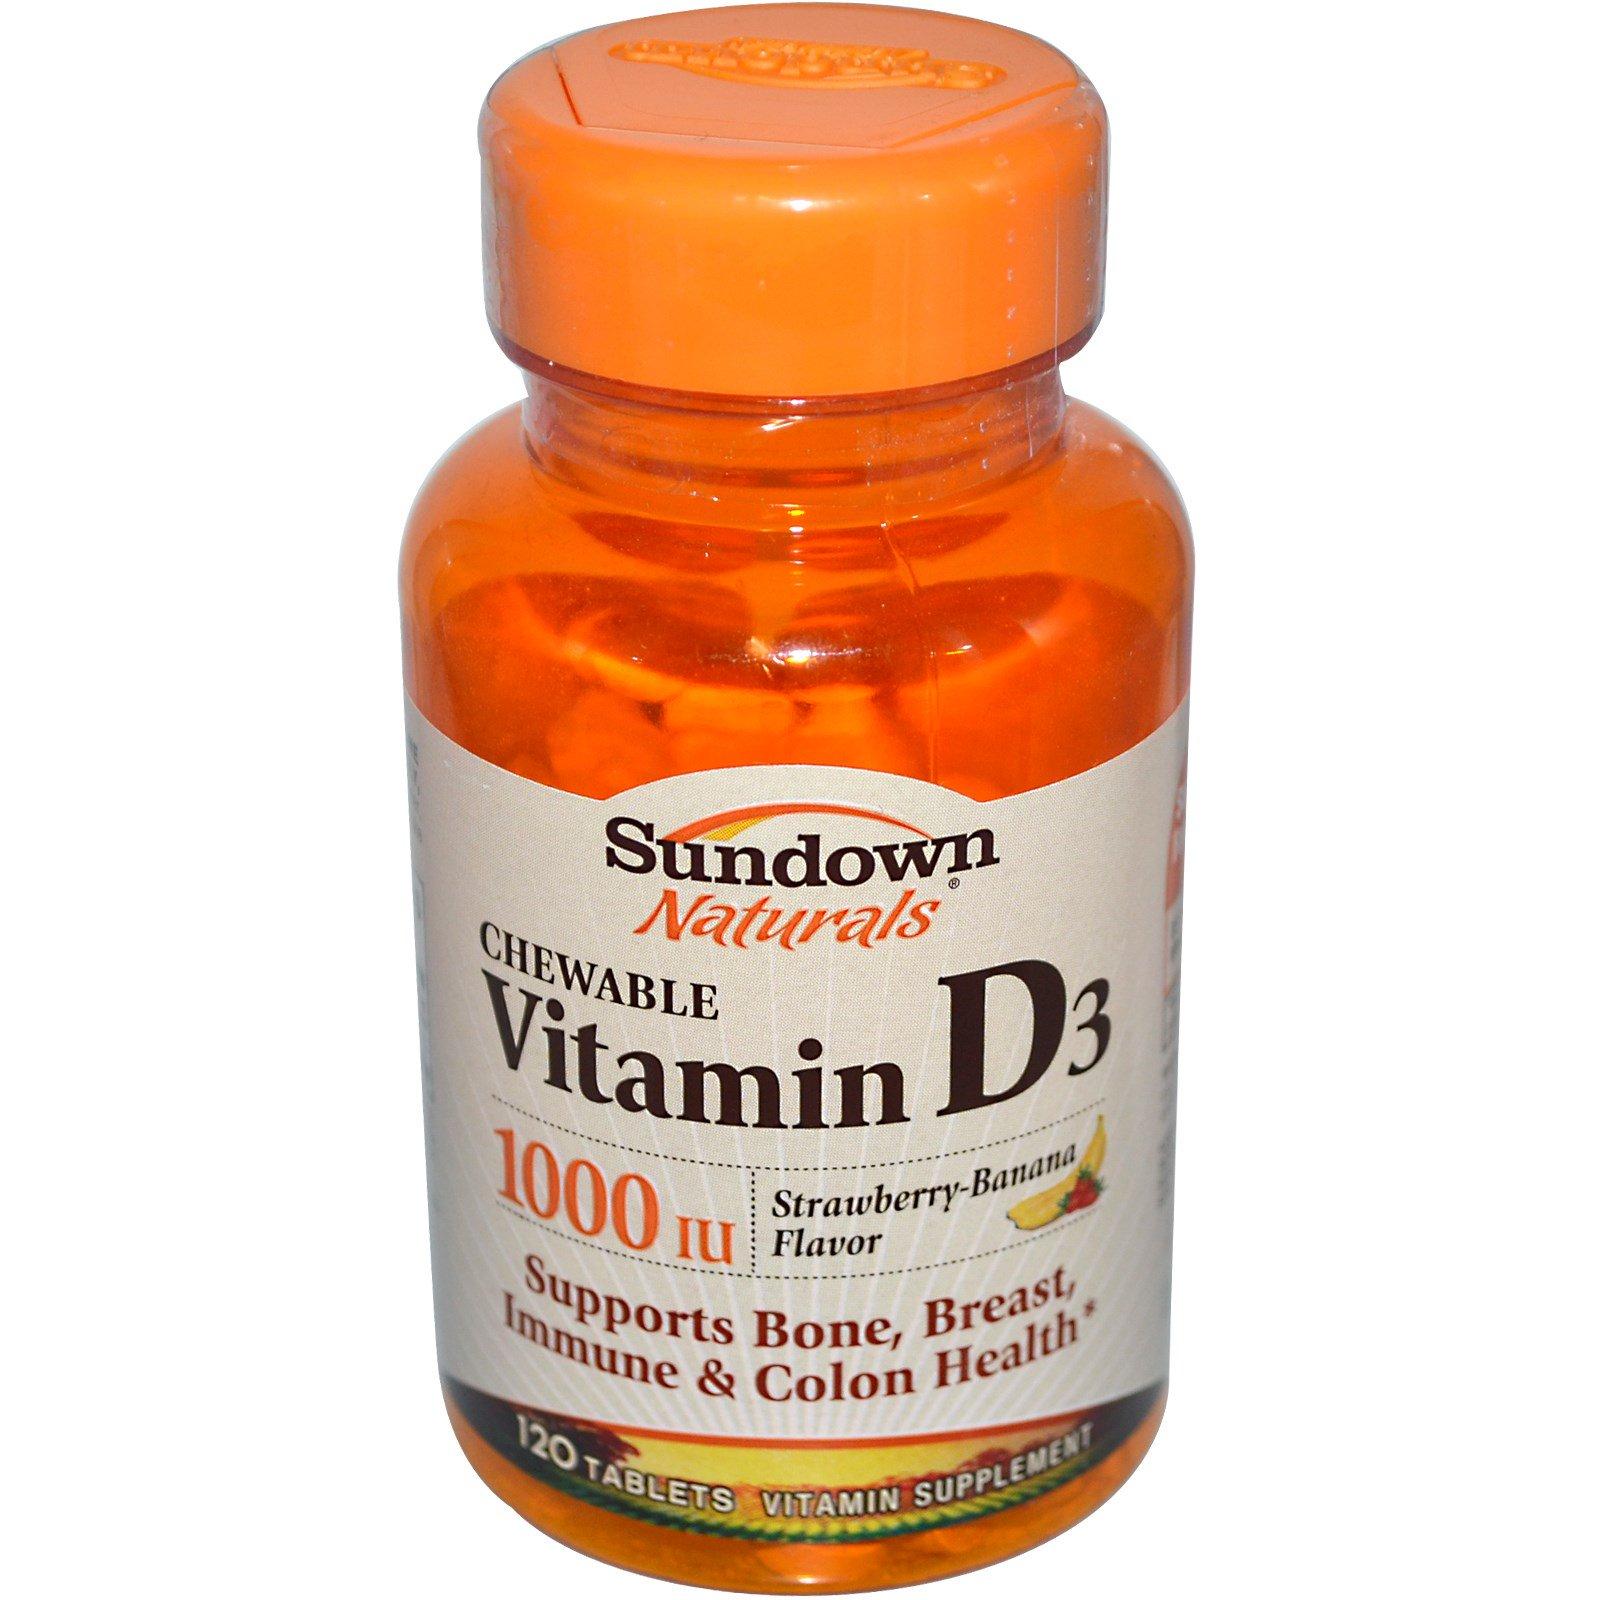 Sundown Naturals, Жевательный витамин D3, аромат клубники-банана, 1000 МЕ, 120 таблеток